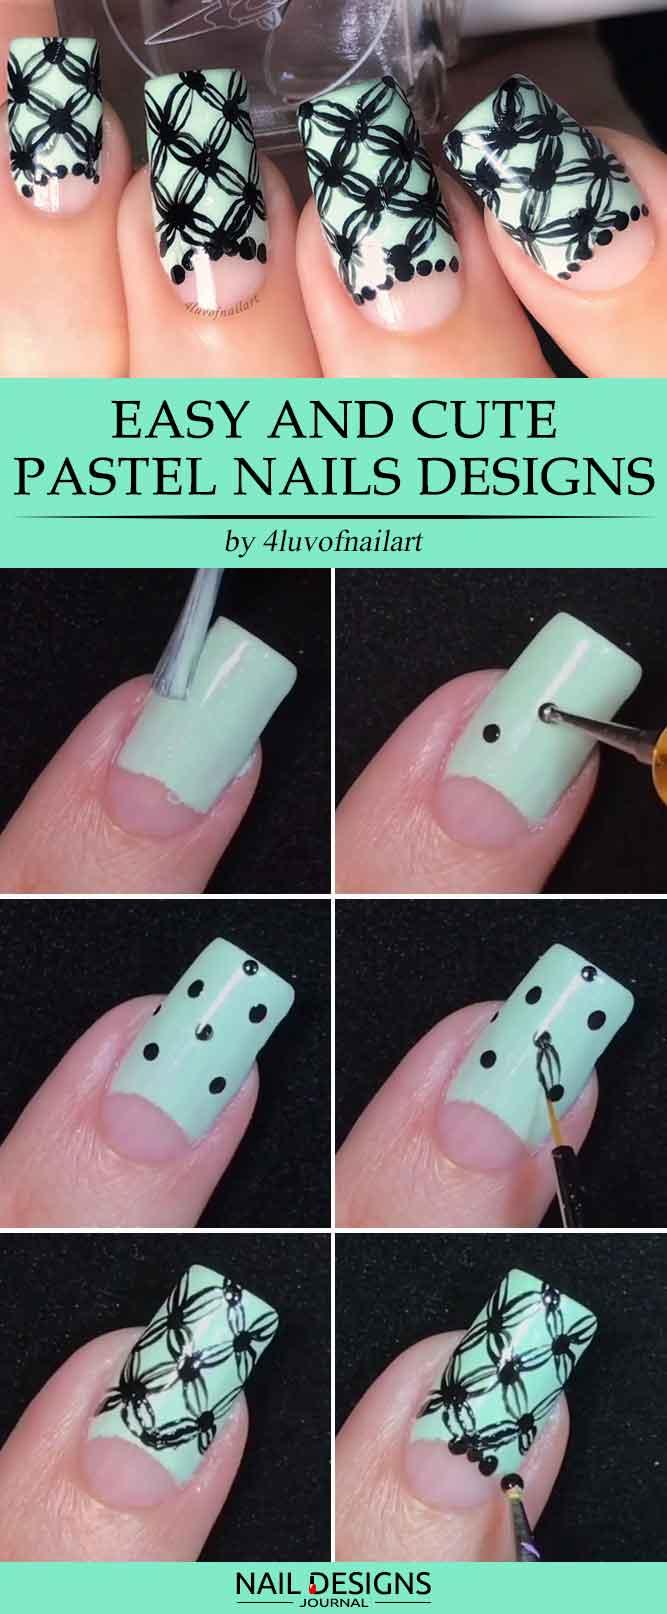 15 Super Easy Nail Designs DIY Tutorials - crazyforus